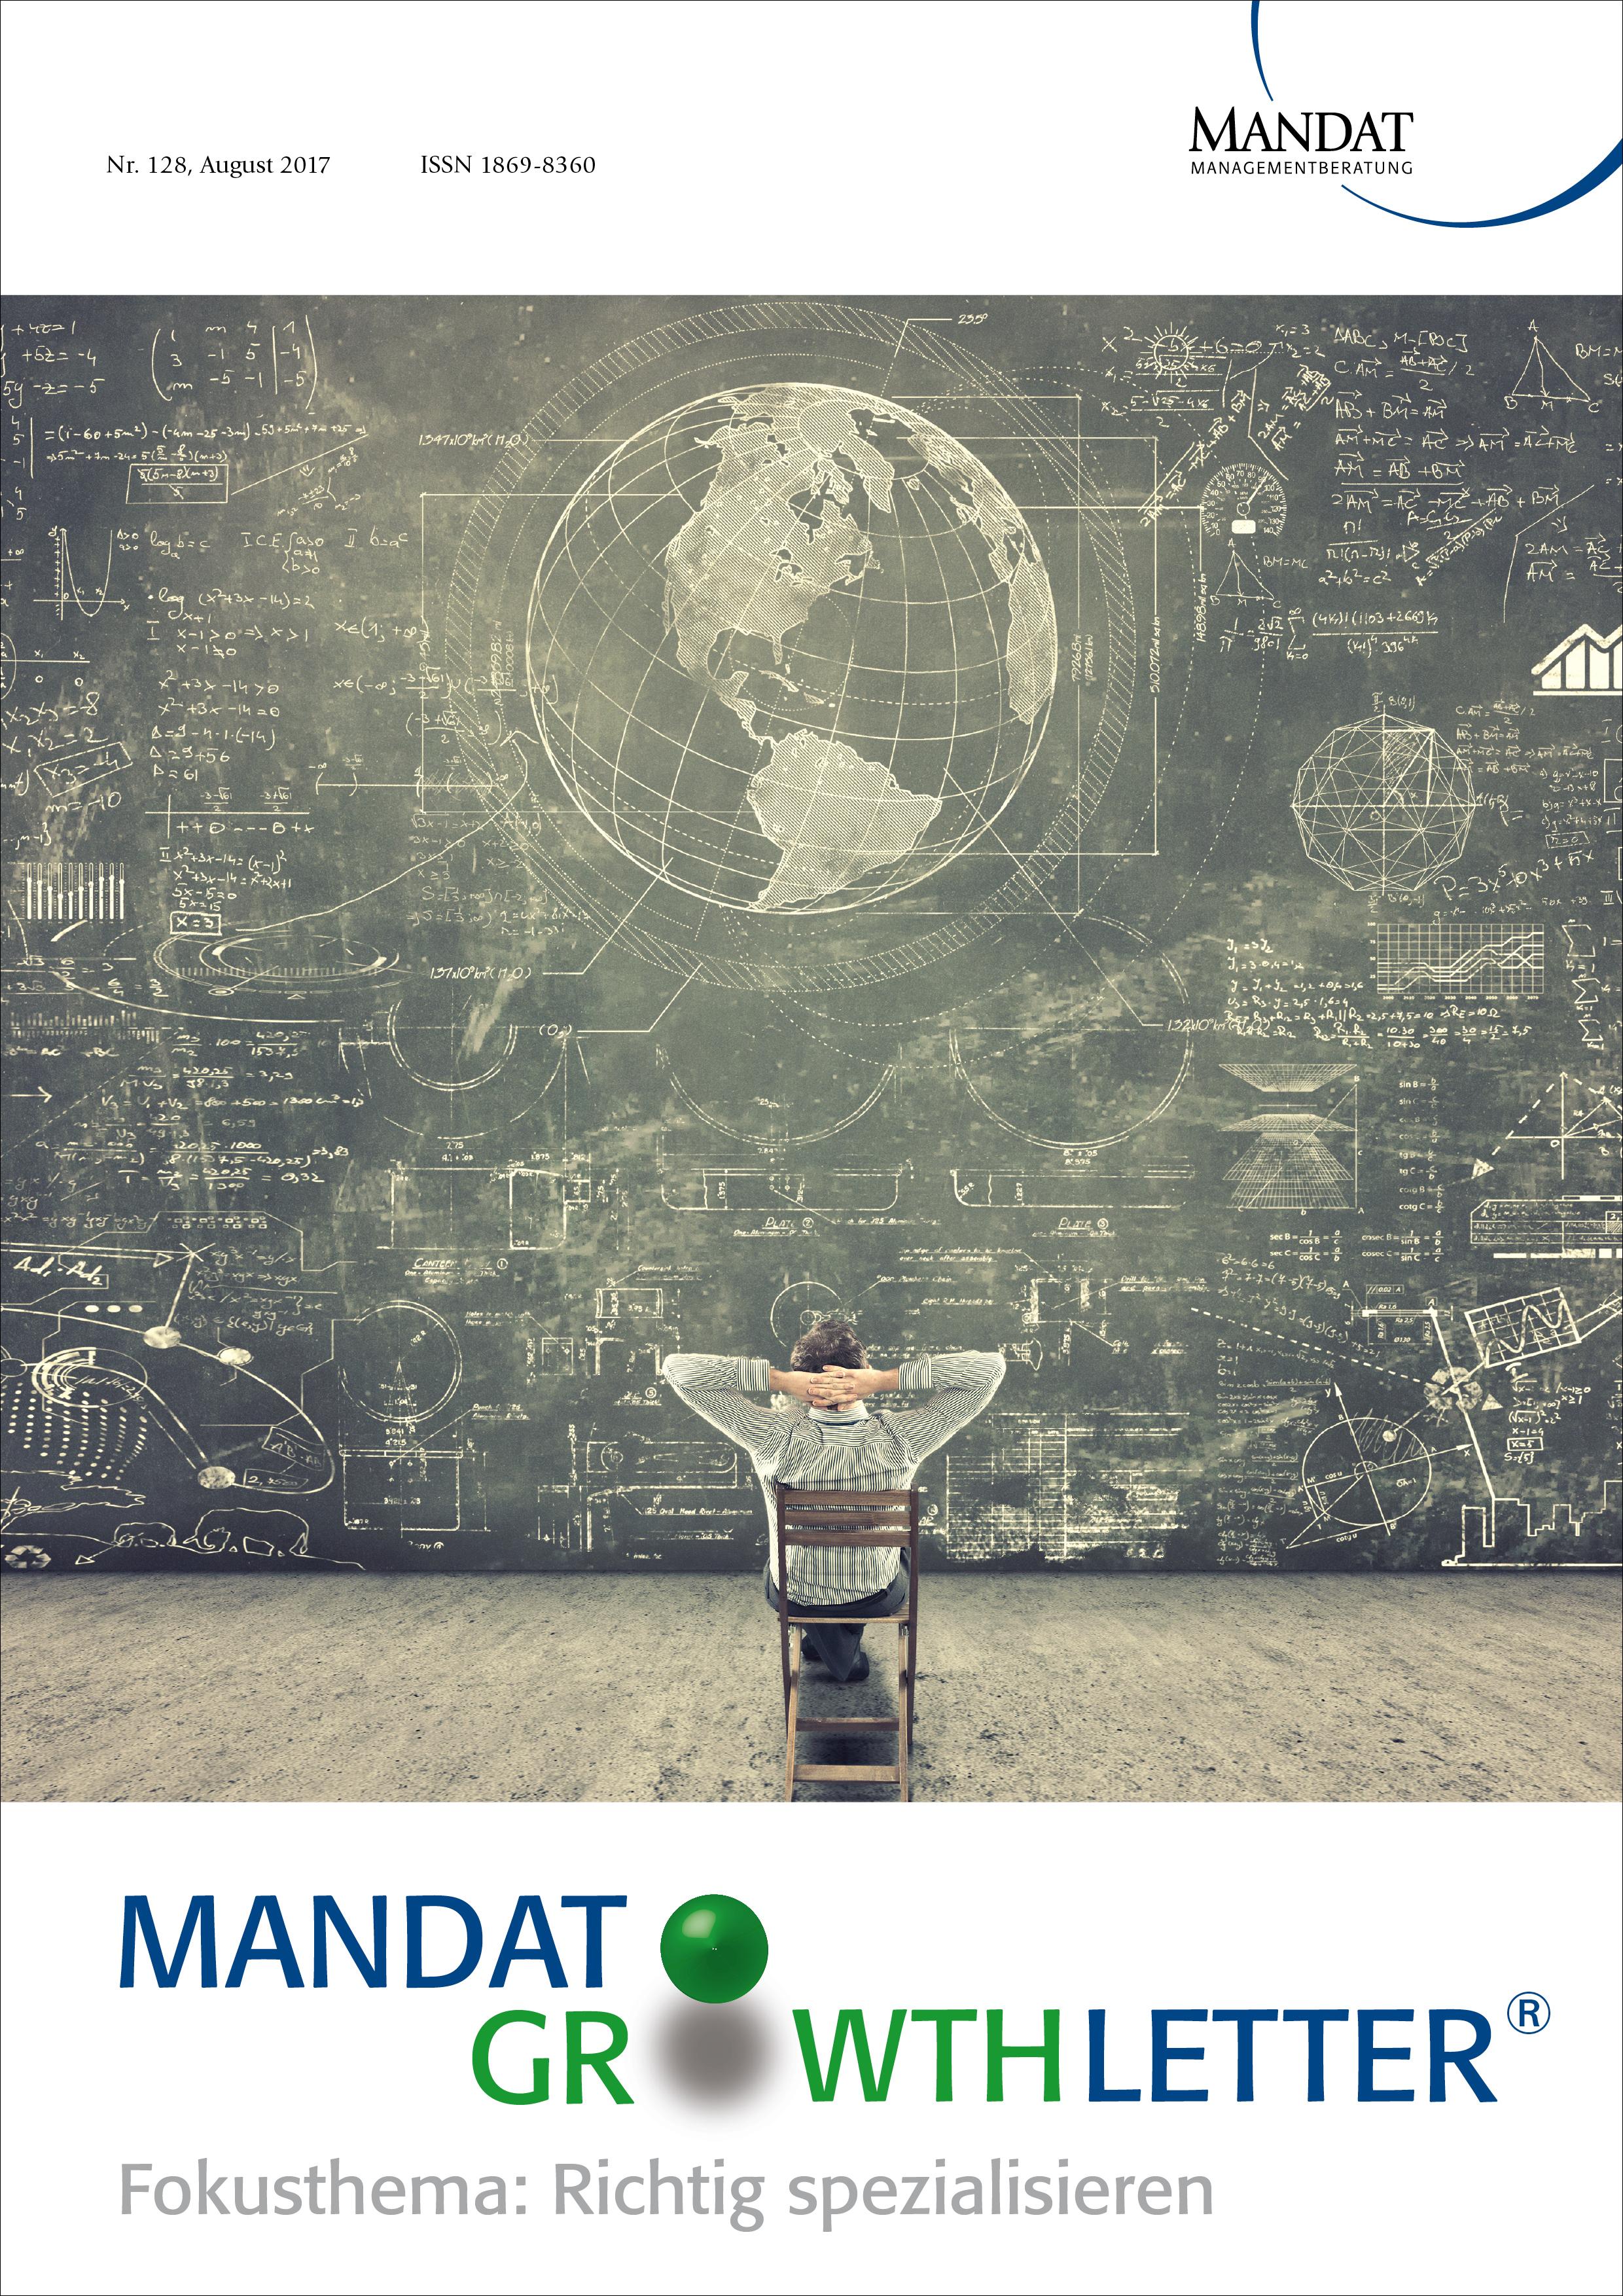 Mandat Cover